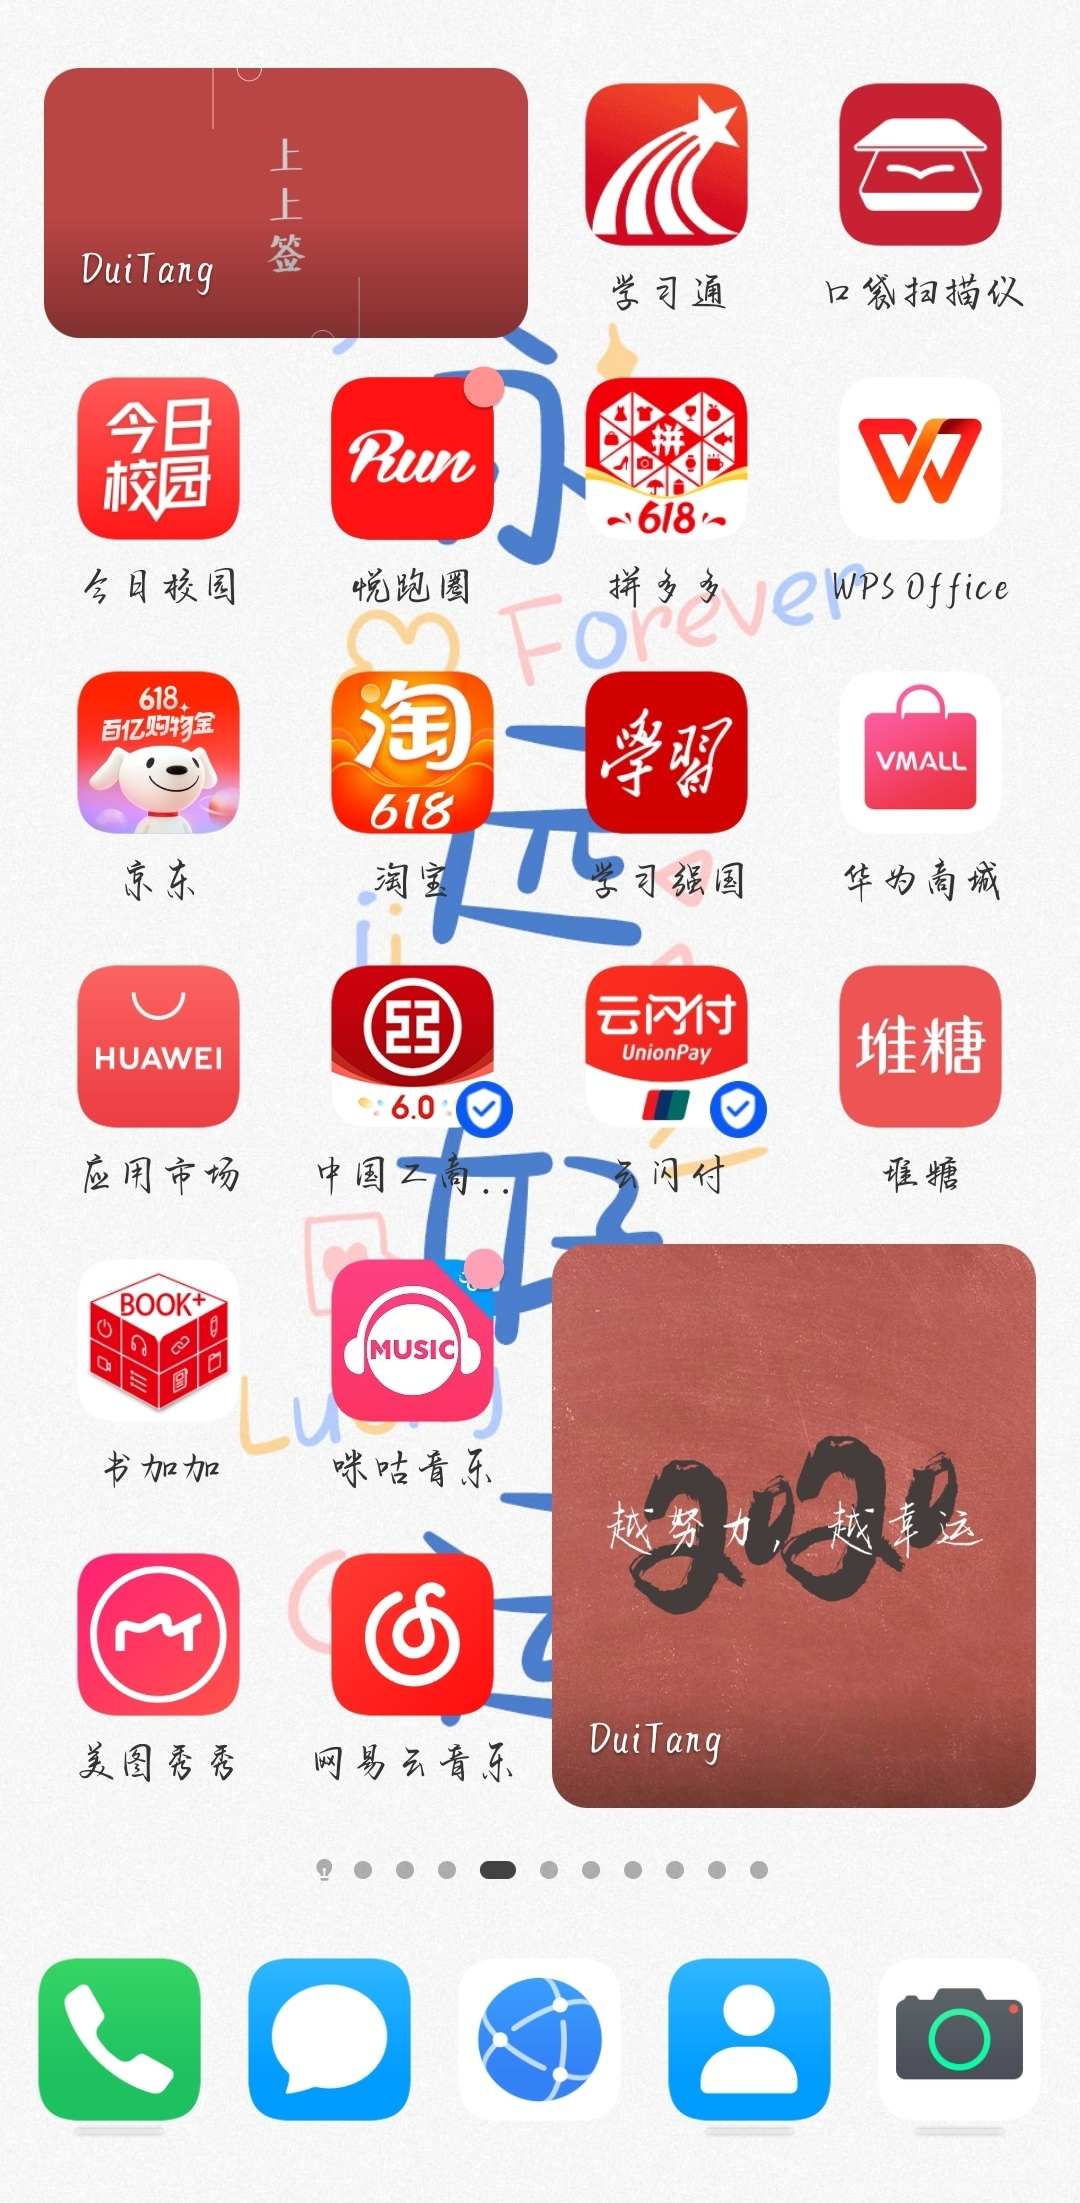 Screenshot_20210611_123849_com.huawei.android.launcher_edit_152762732919919.jpg